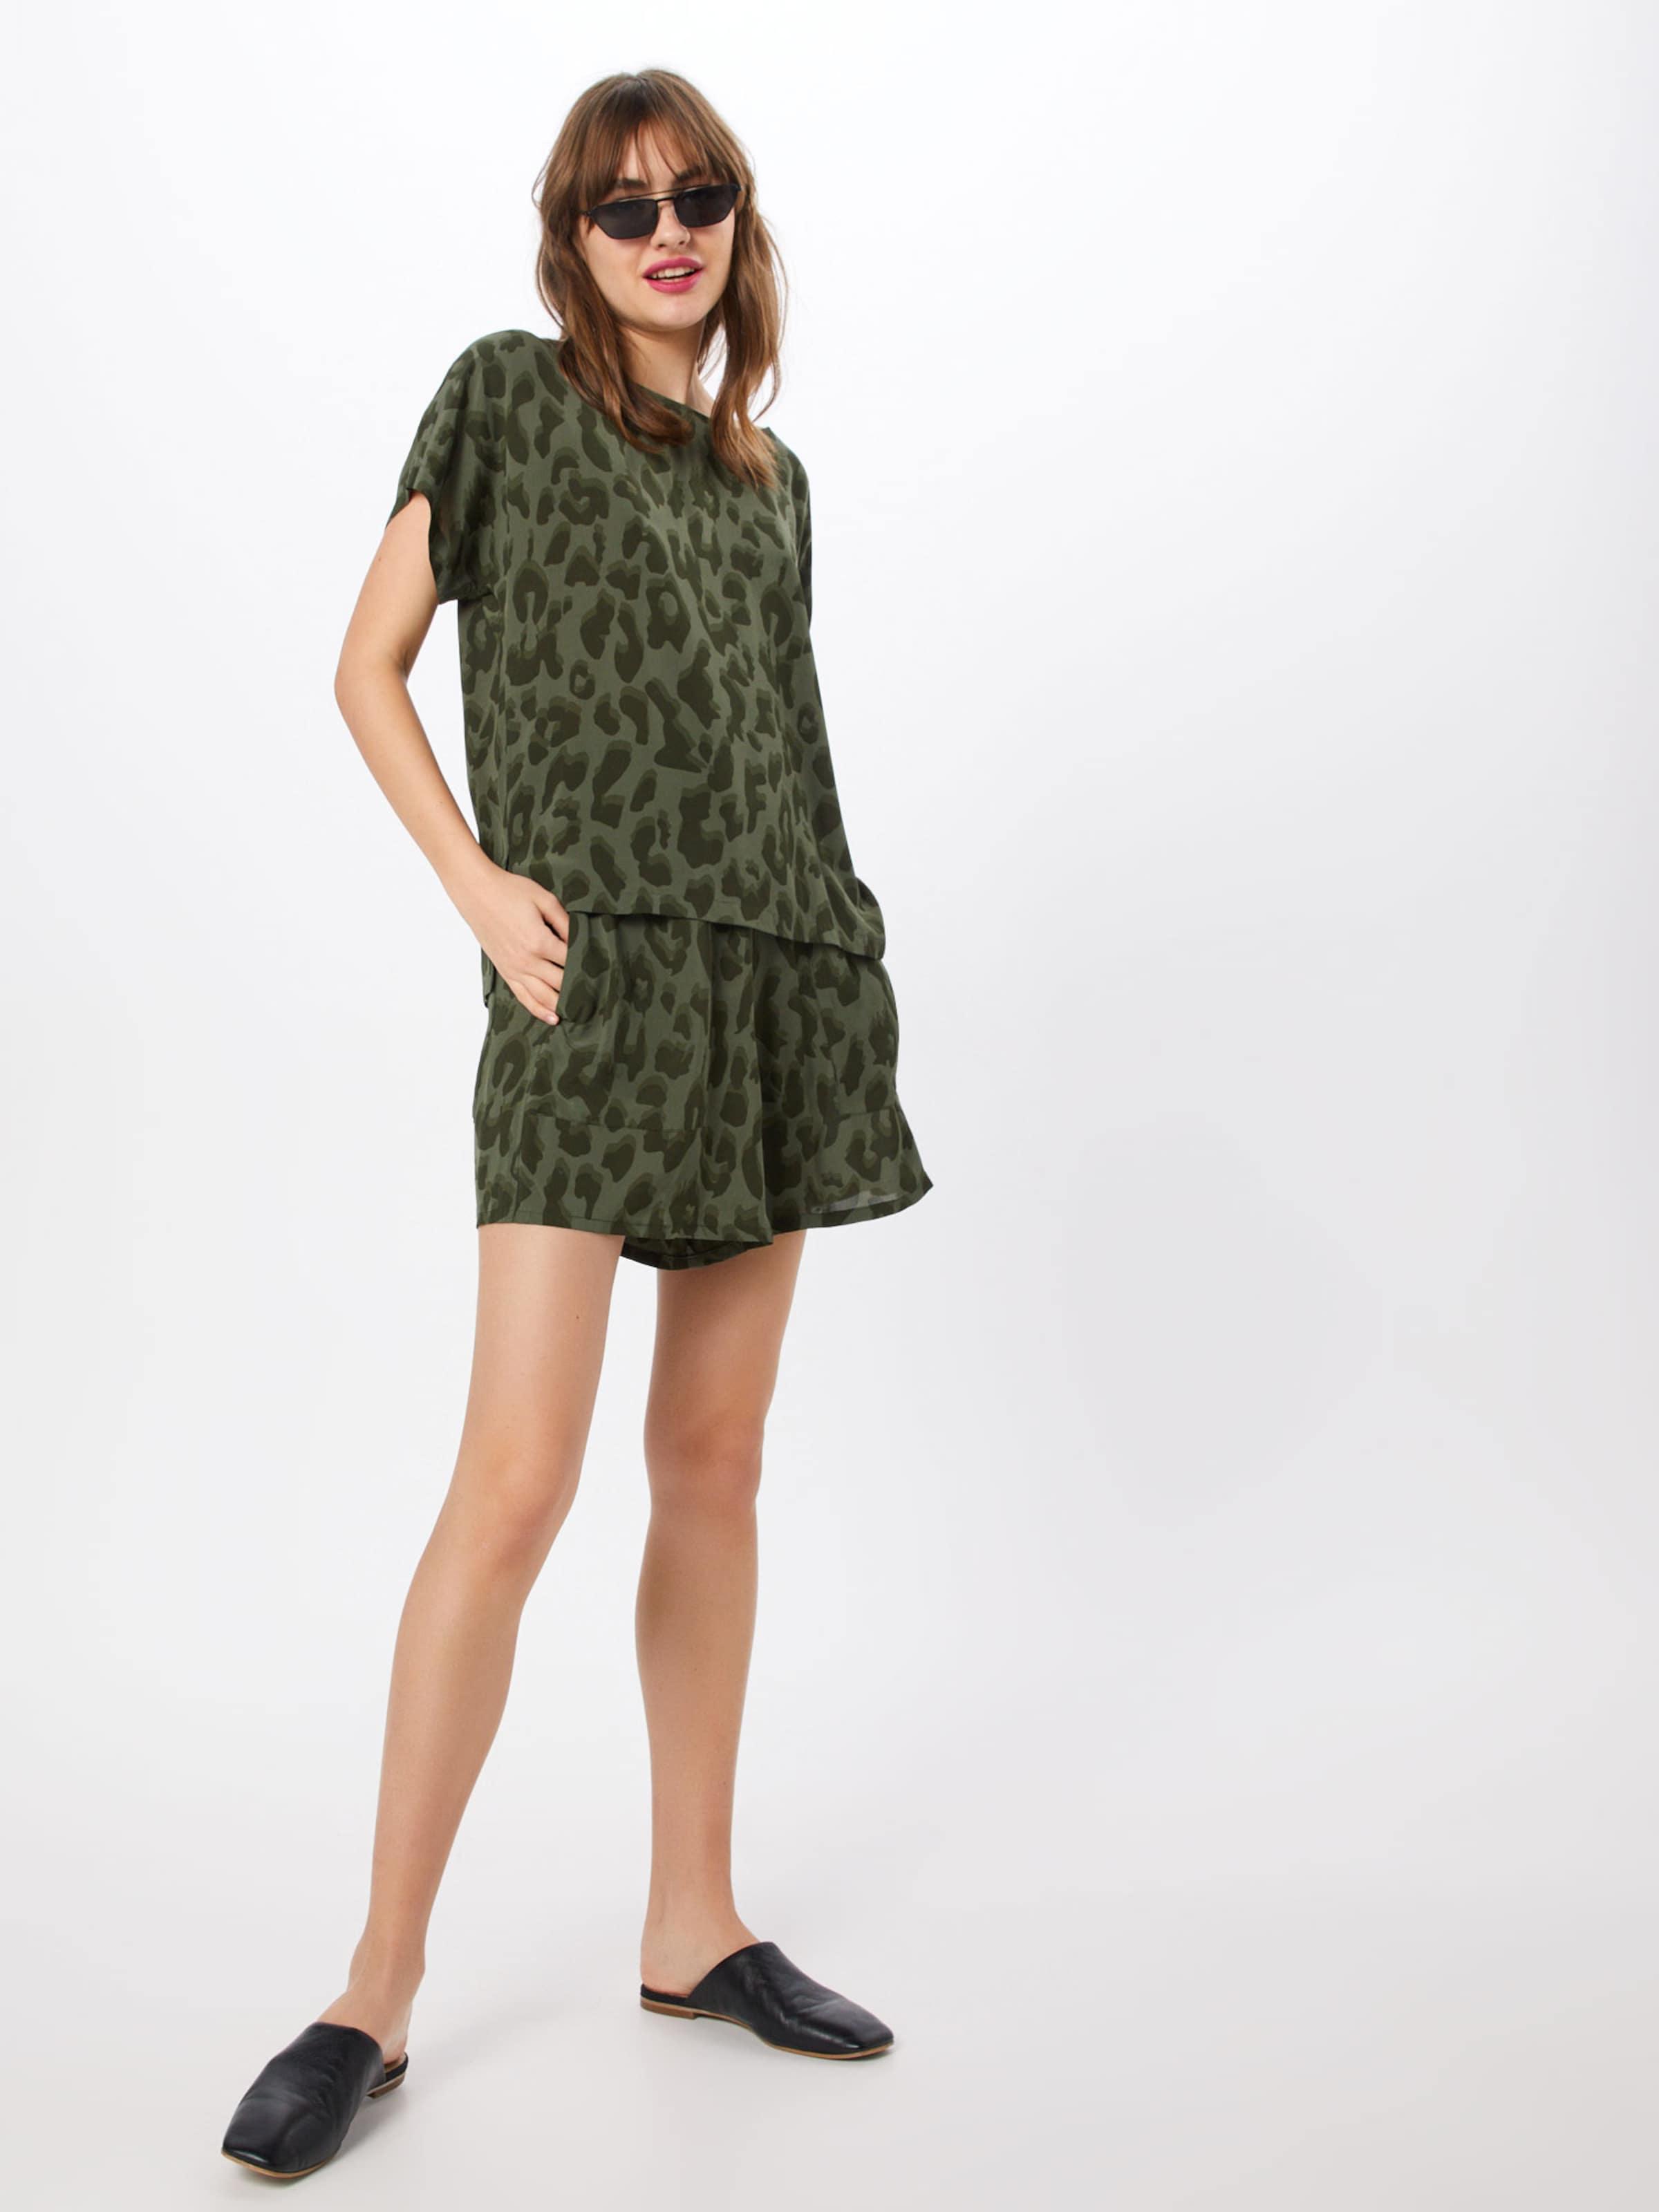 Blusenshirt Khaki In 'somia' Blusenshirt Drykorn Drykorn Kc3Tl1JF